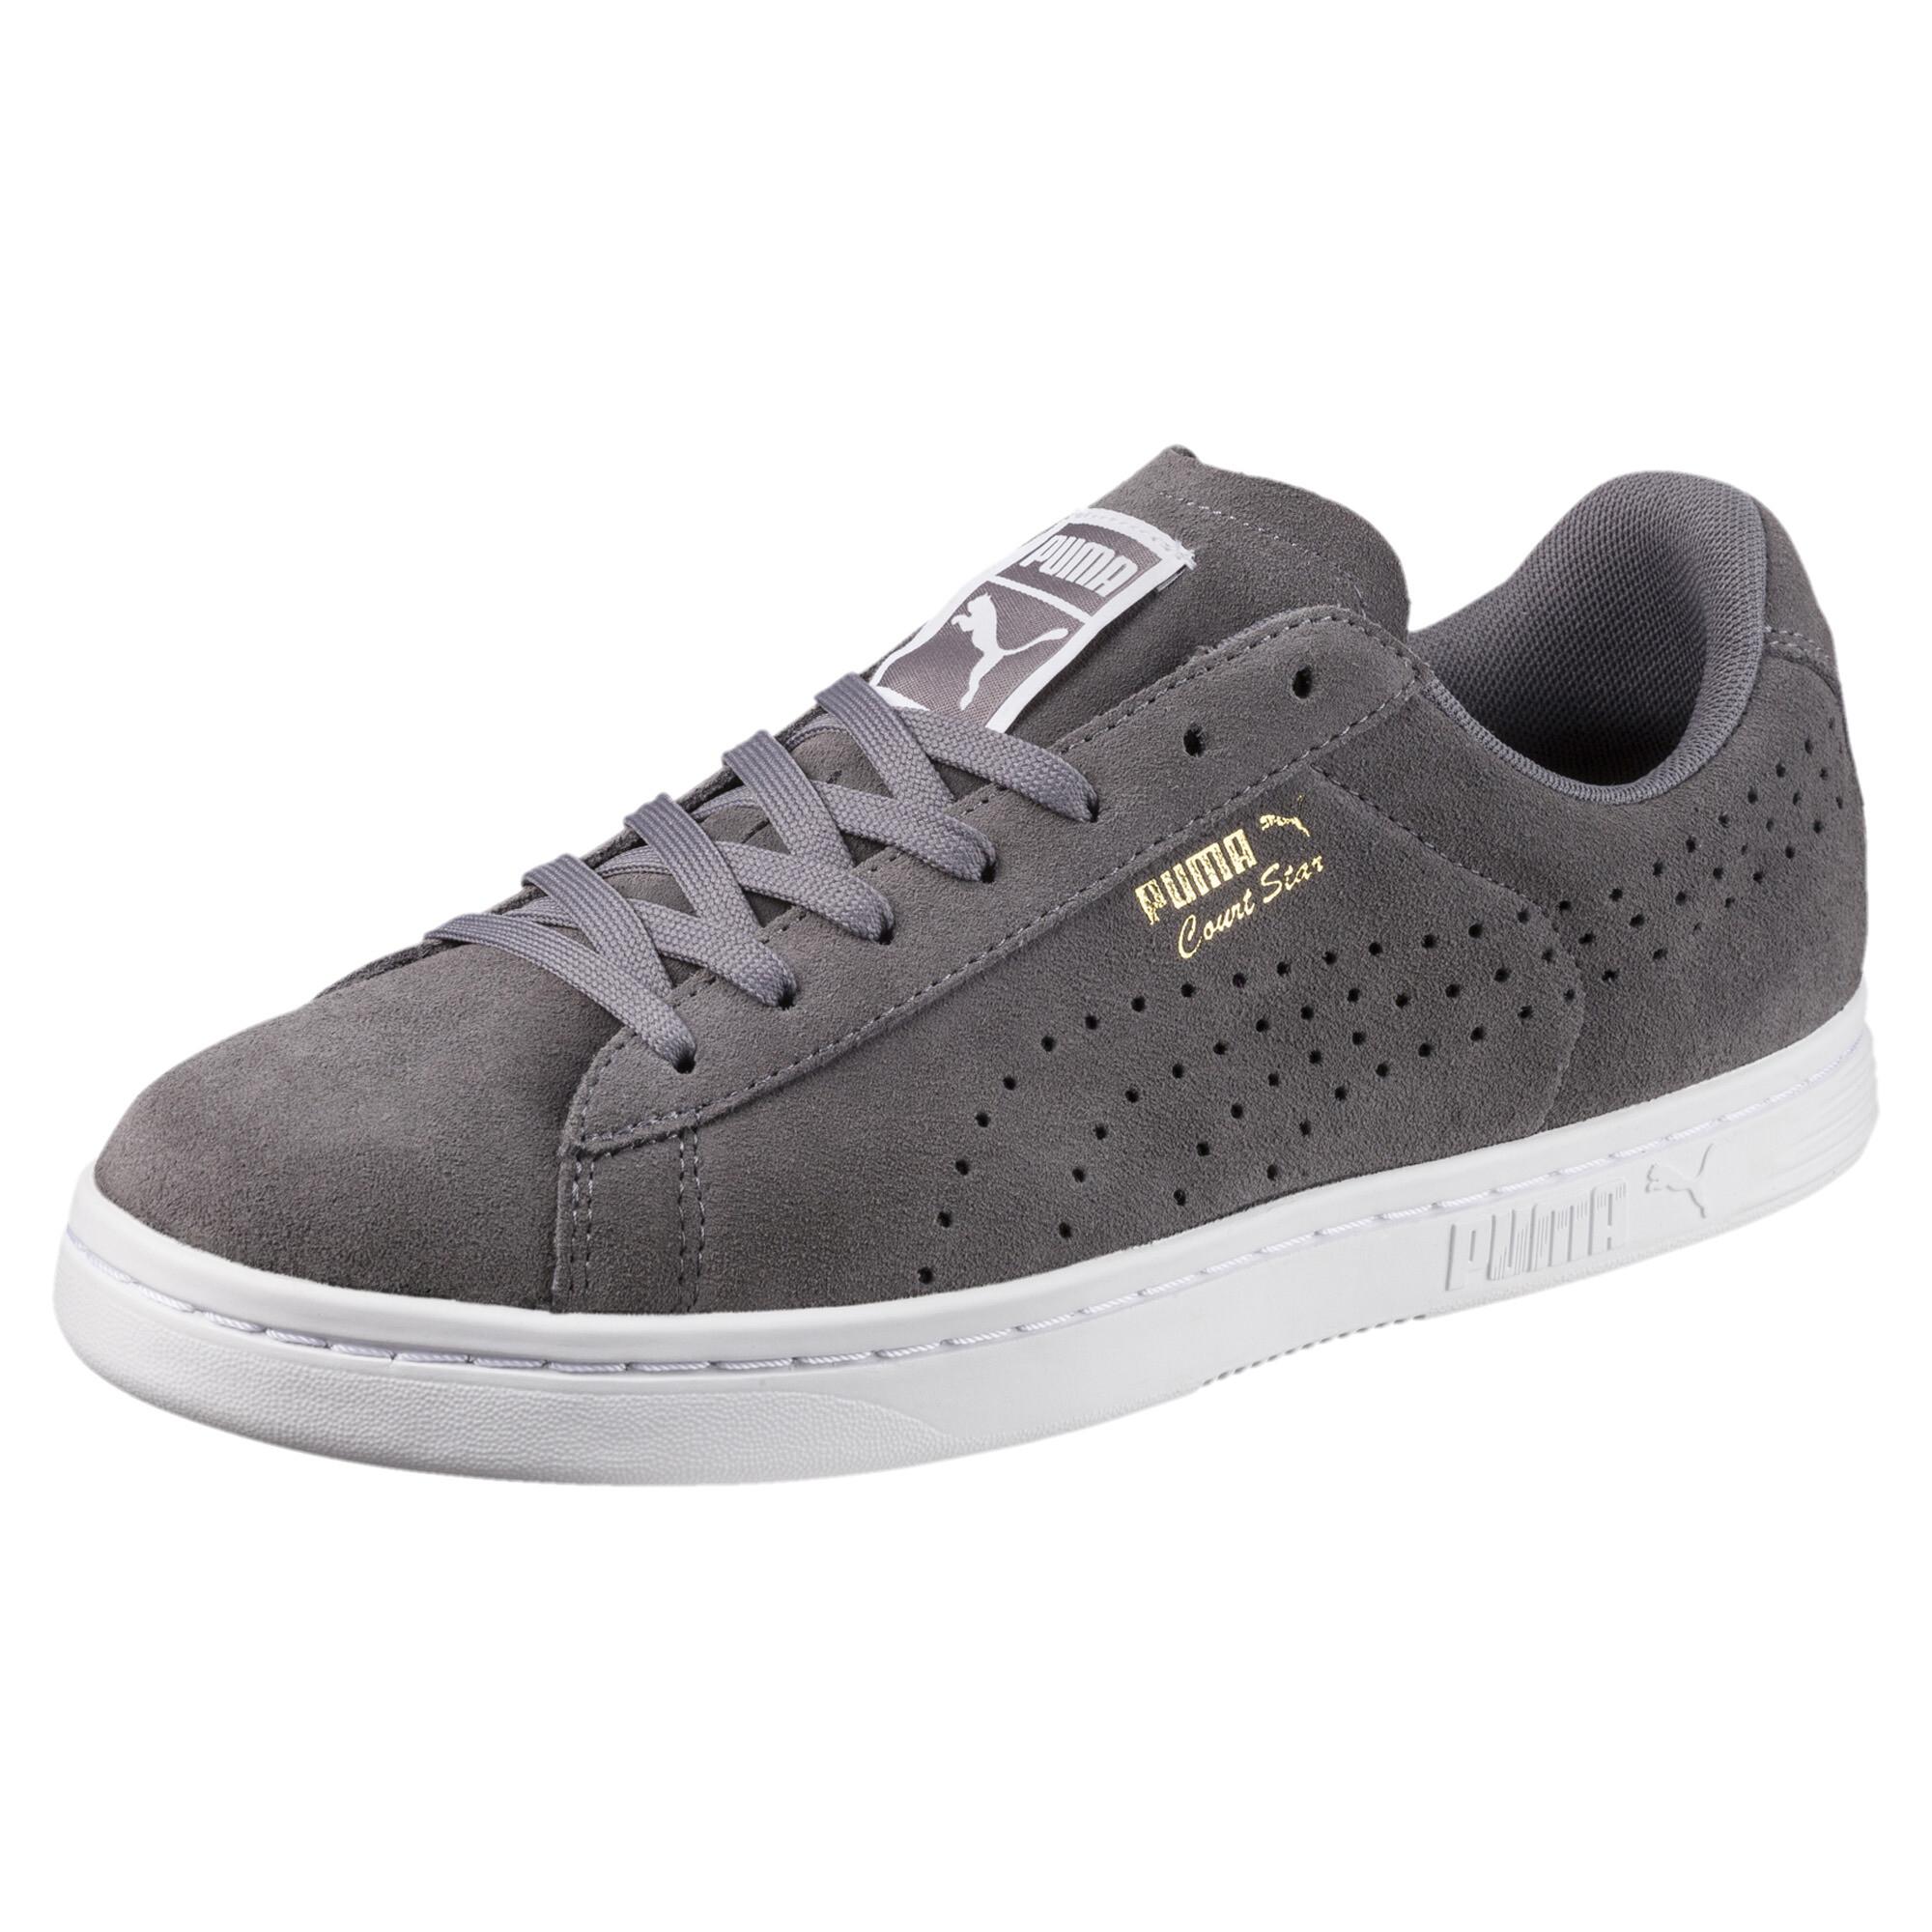 PUMA-Court-Star-Suede-Sneakers-Unisex-Shoe-Sport-Classics thumbnail 11